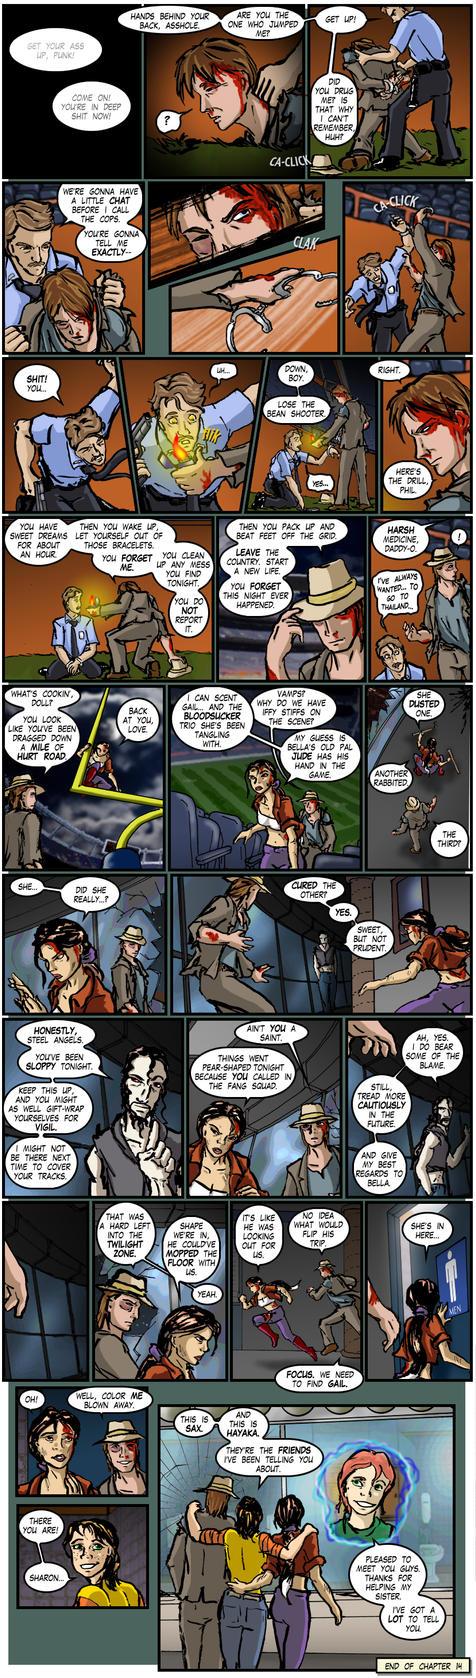 Comic715 by Thunderstruckcomic